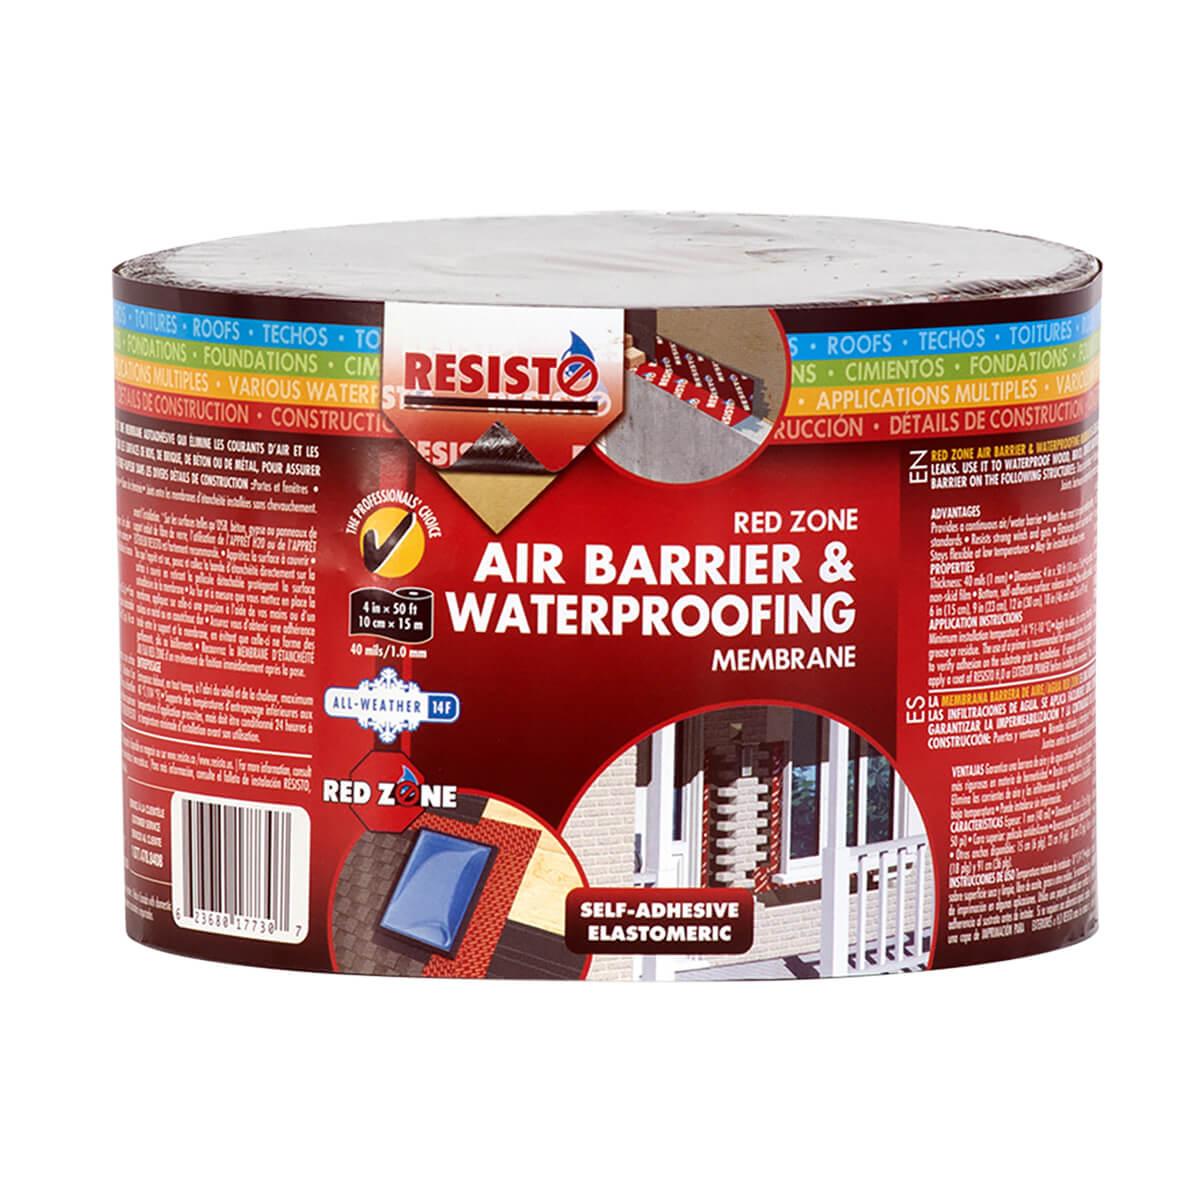 "Redzone Air Barrier & Waterproofing Membrane - 4"" x 50'"